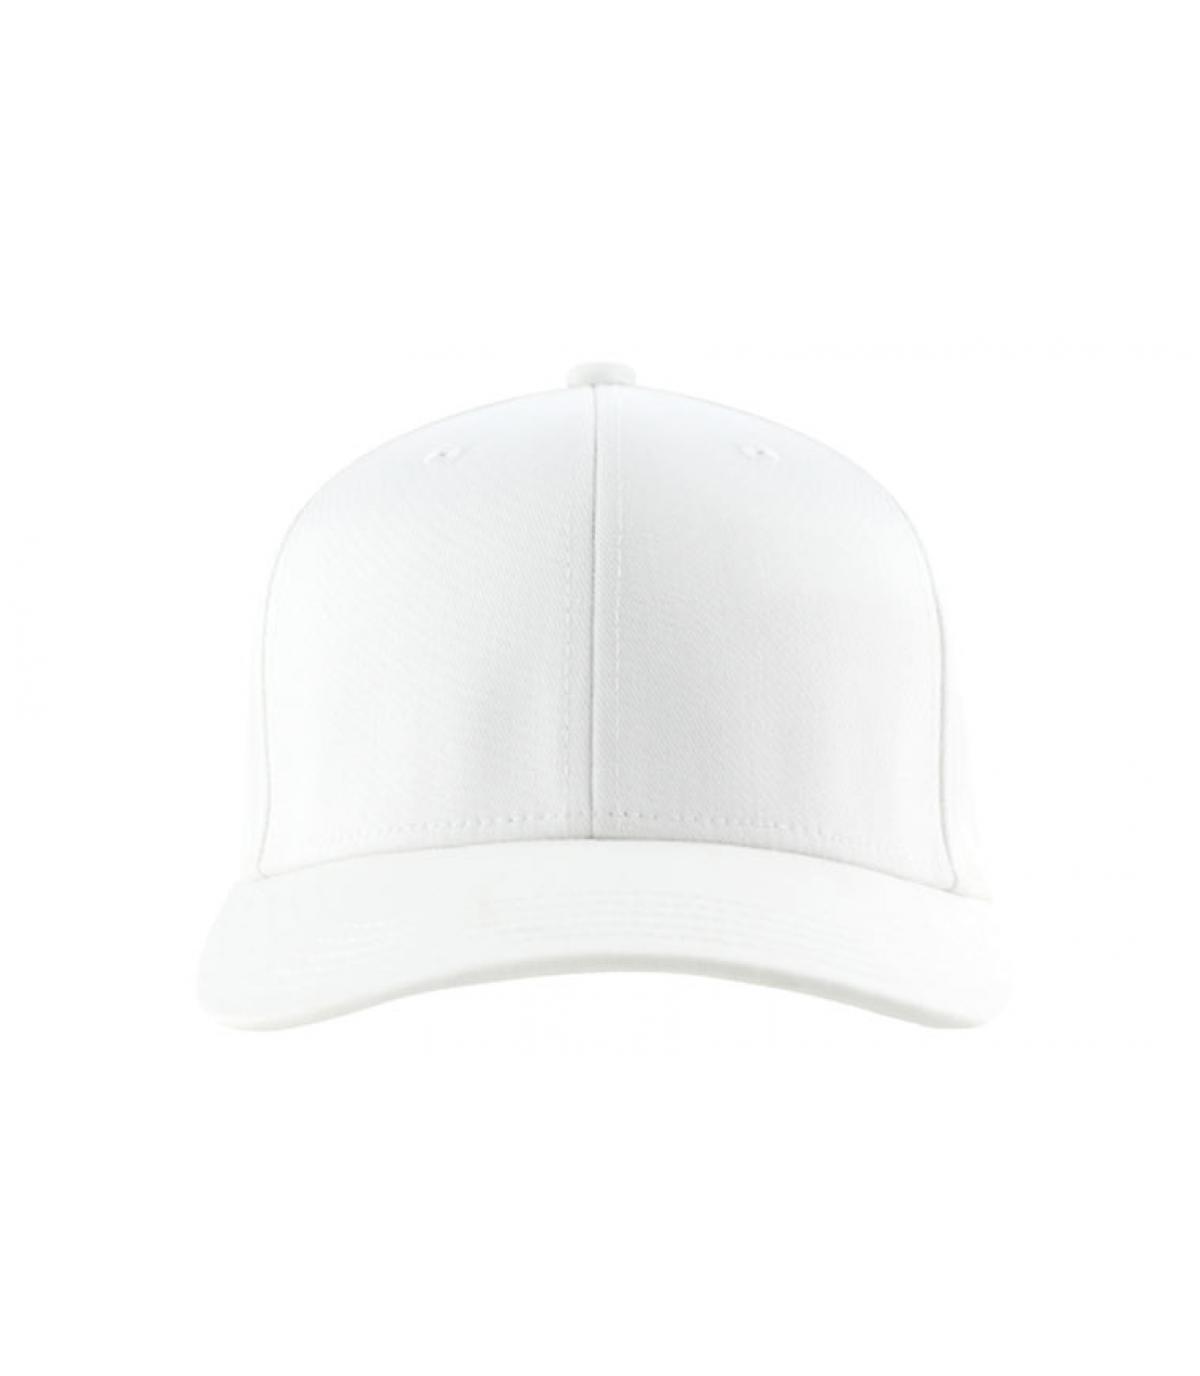 Curve Blank white